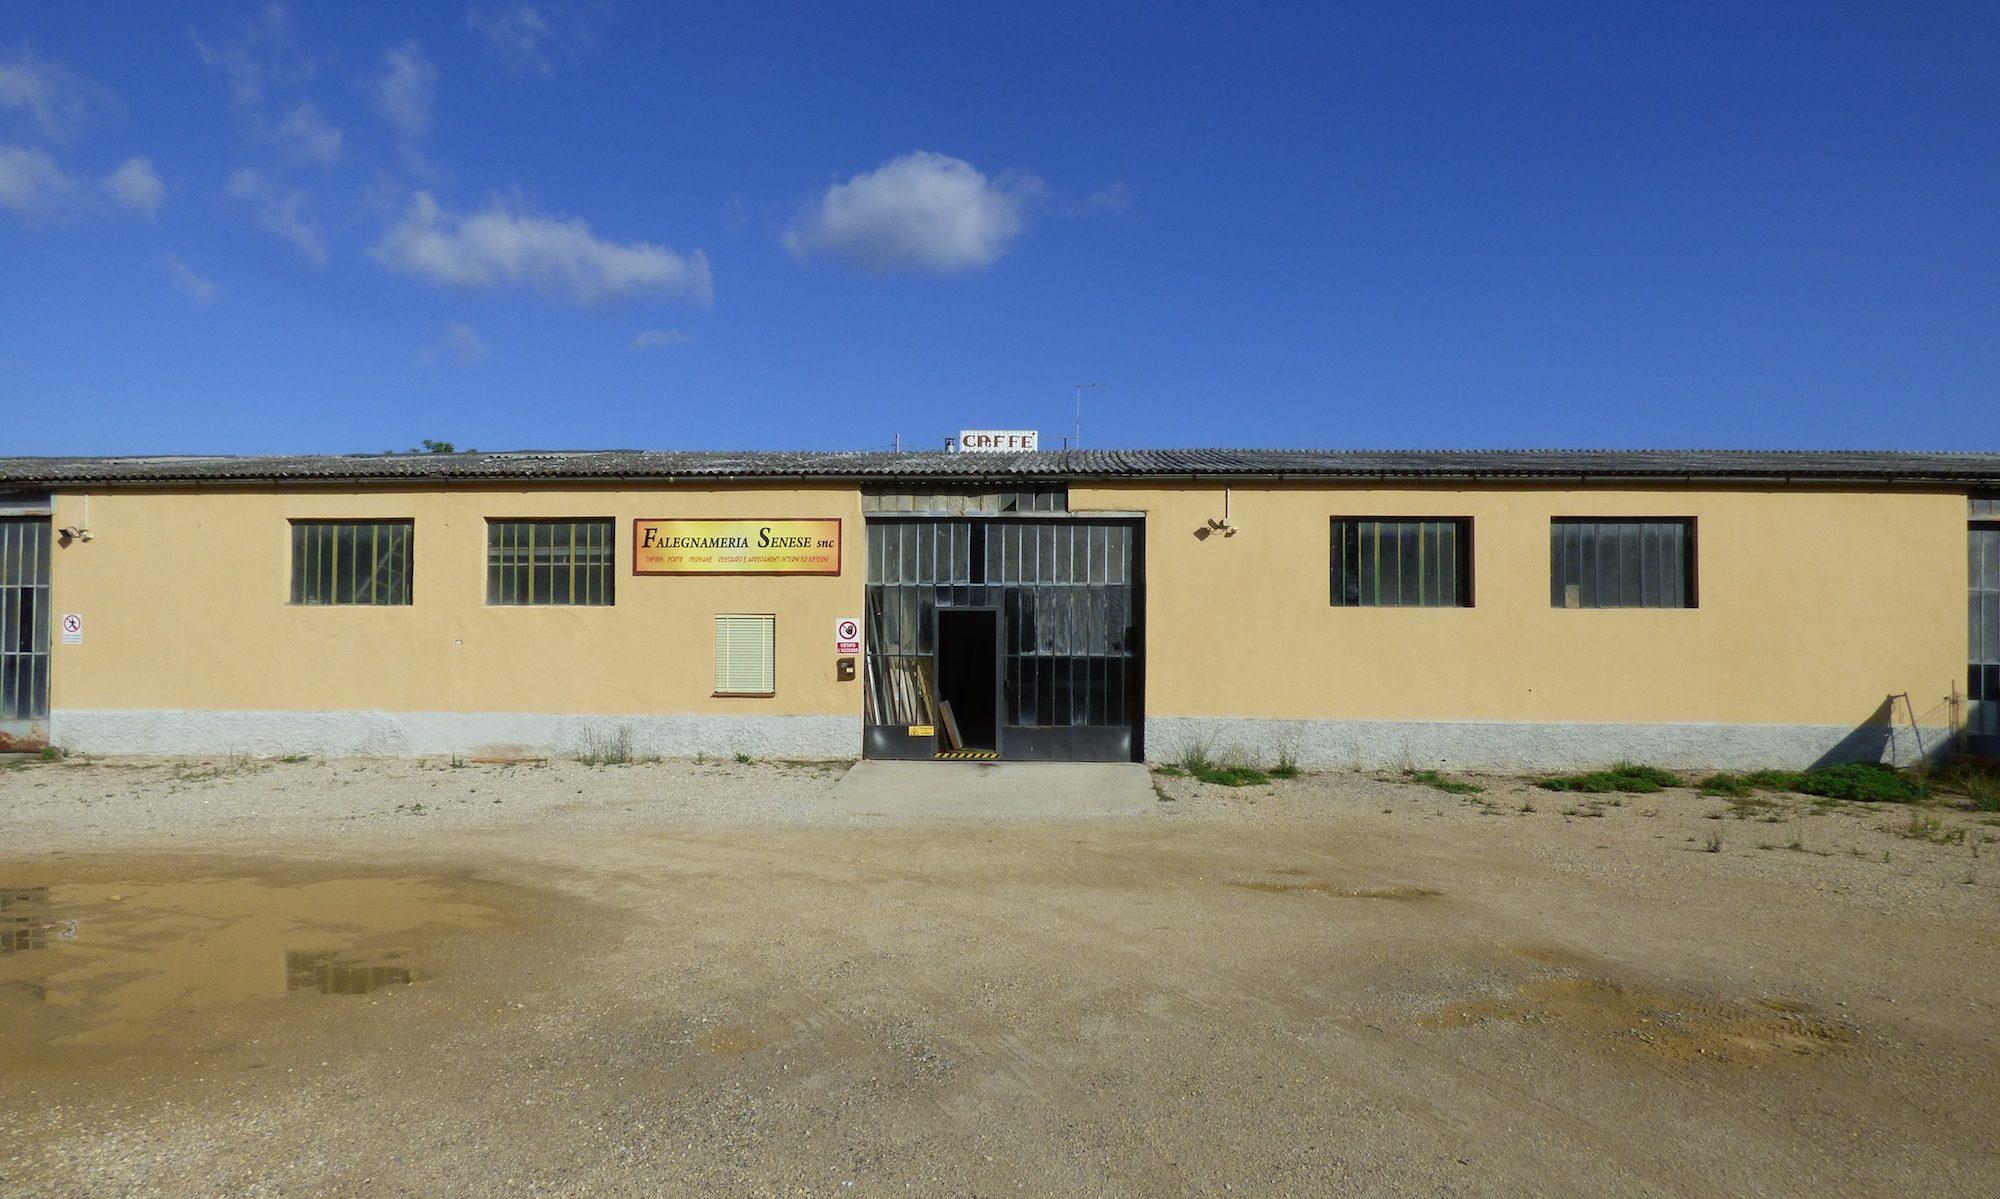 Falegnameria Senese - falegname siena - porte - infissi - strutture in legno - rivestimento piscine